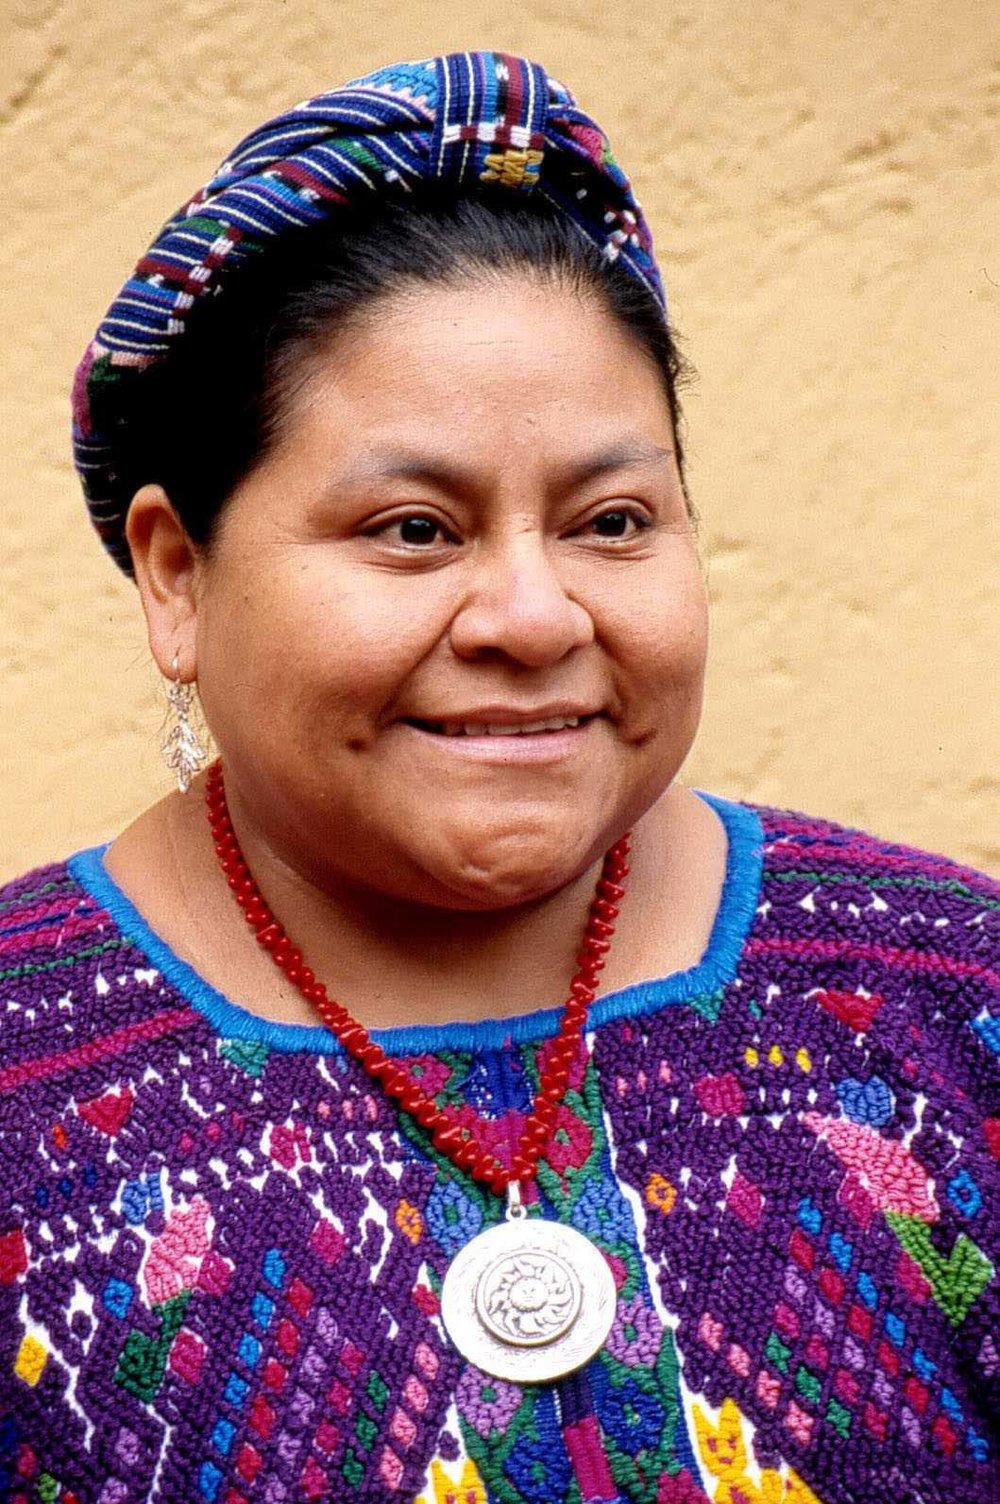 Rigoberta Menchú - Guatemalan indigenous rights and women's rights activist, Nobel Peace Prize recipient